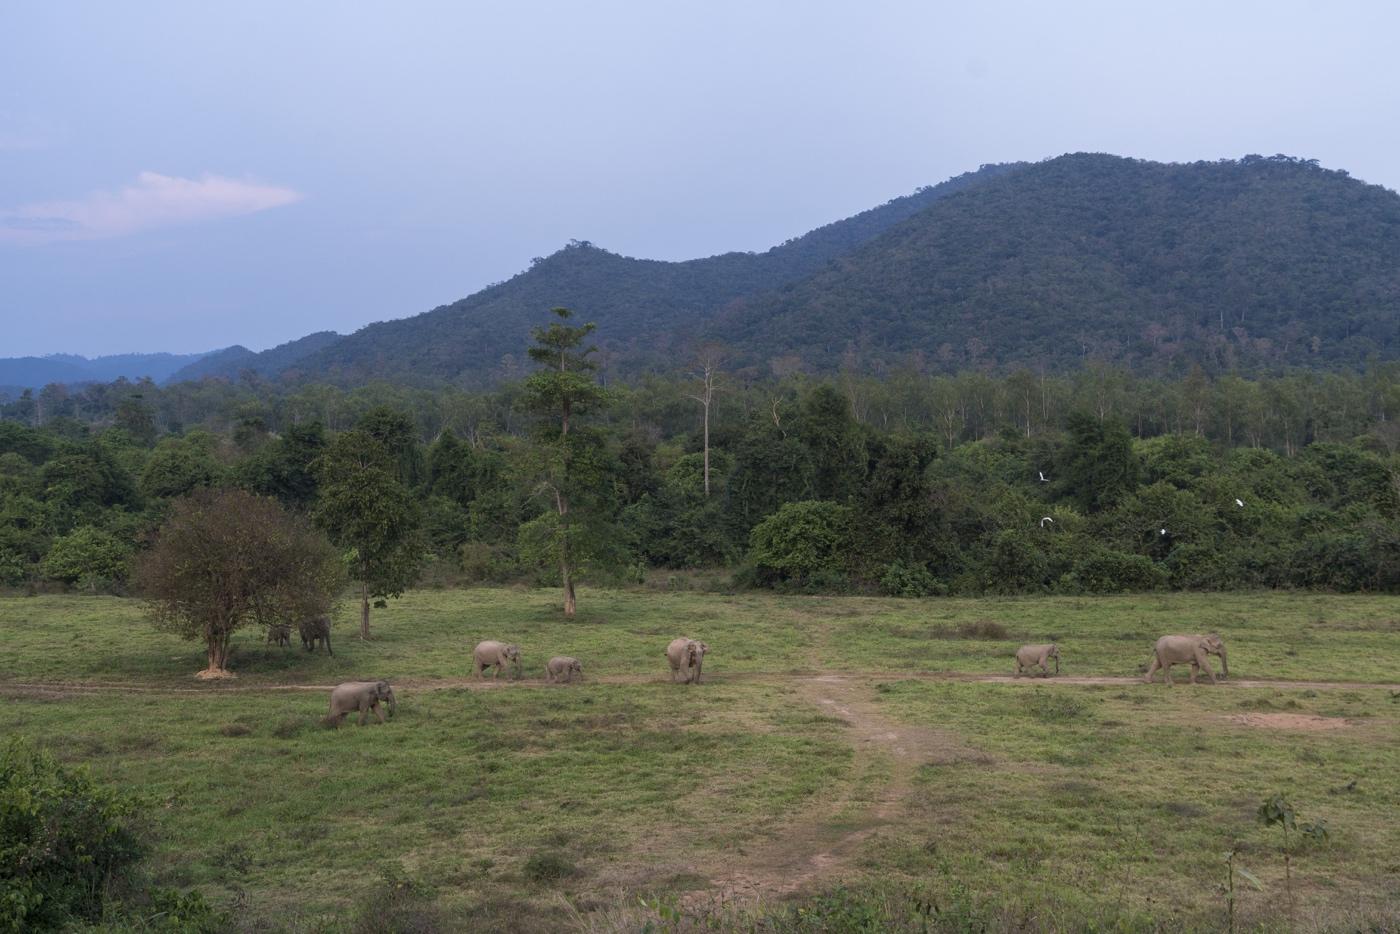 WWF Thailand, Kui Buri - Elephants